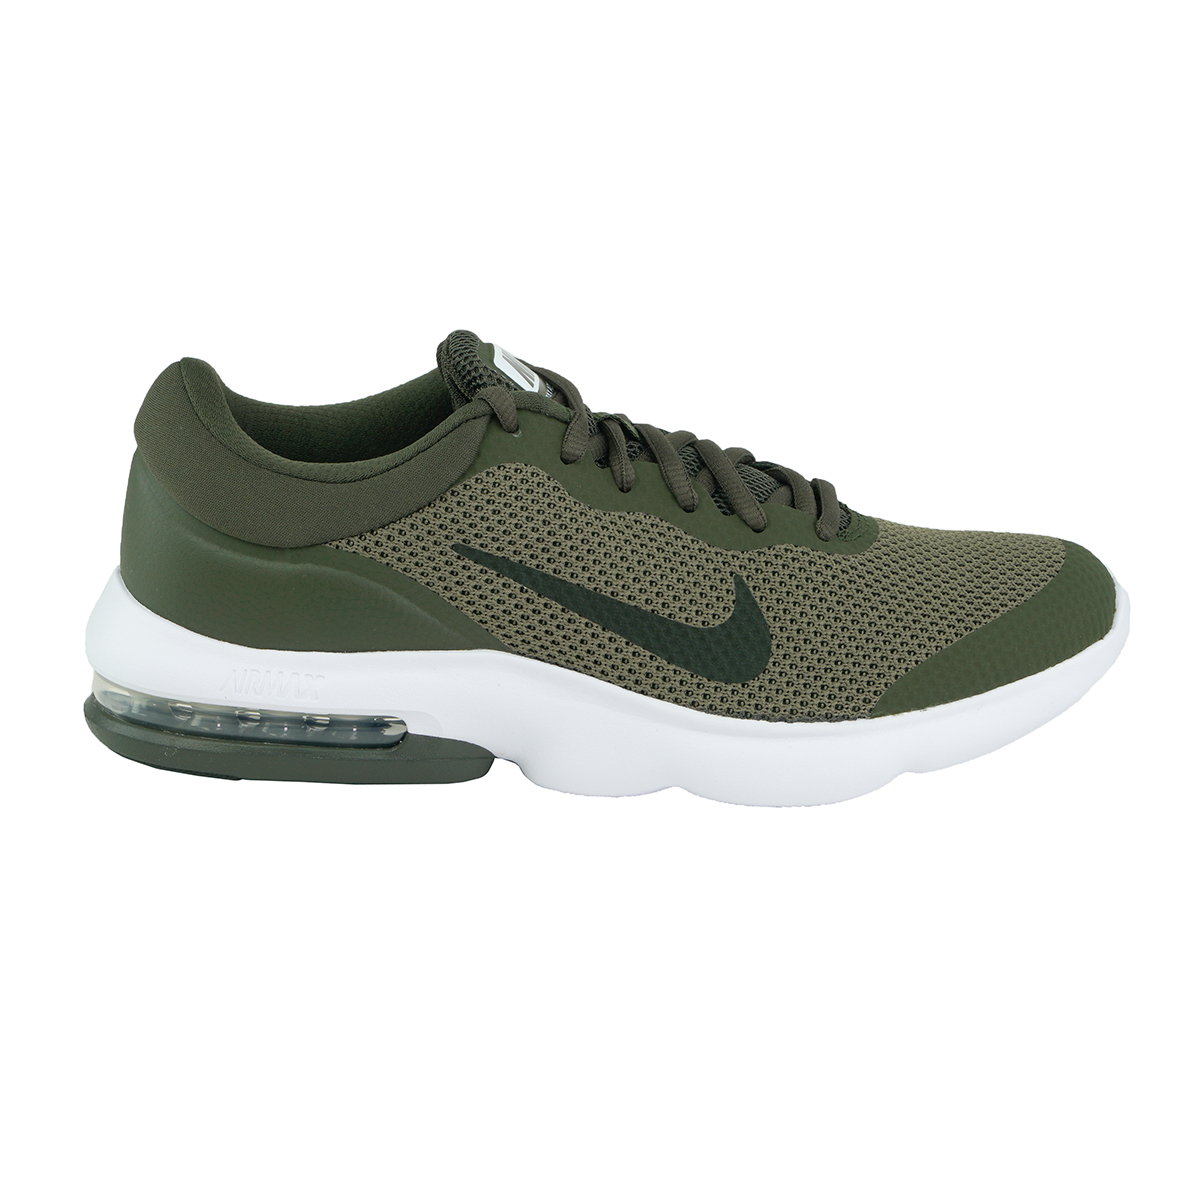 b499a3e9 Nike Men's Air Max Advantage Shoes | eBay